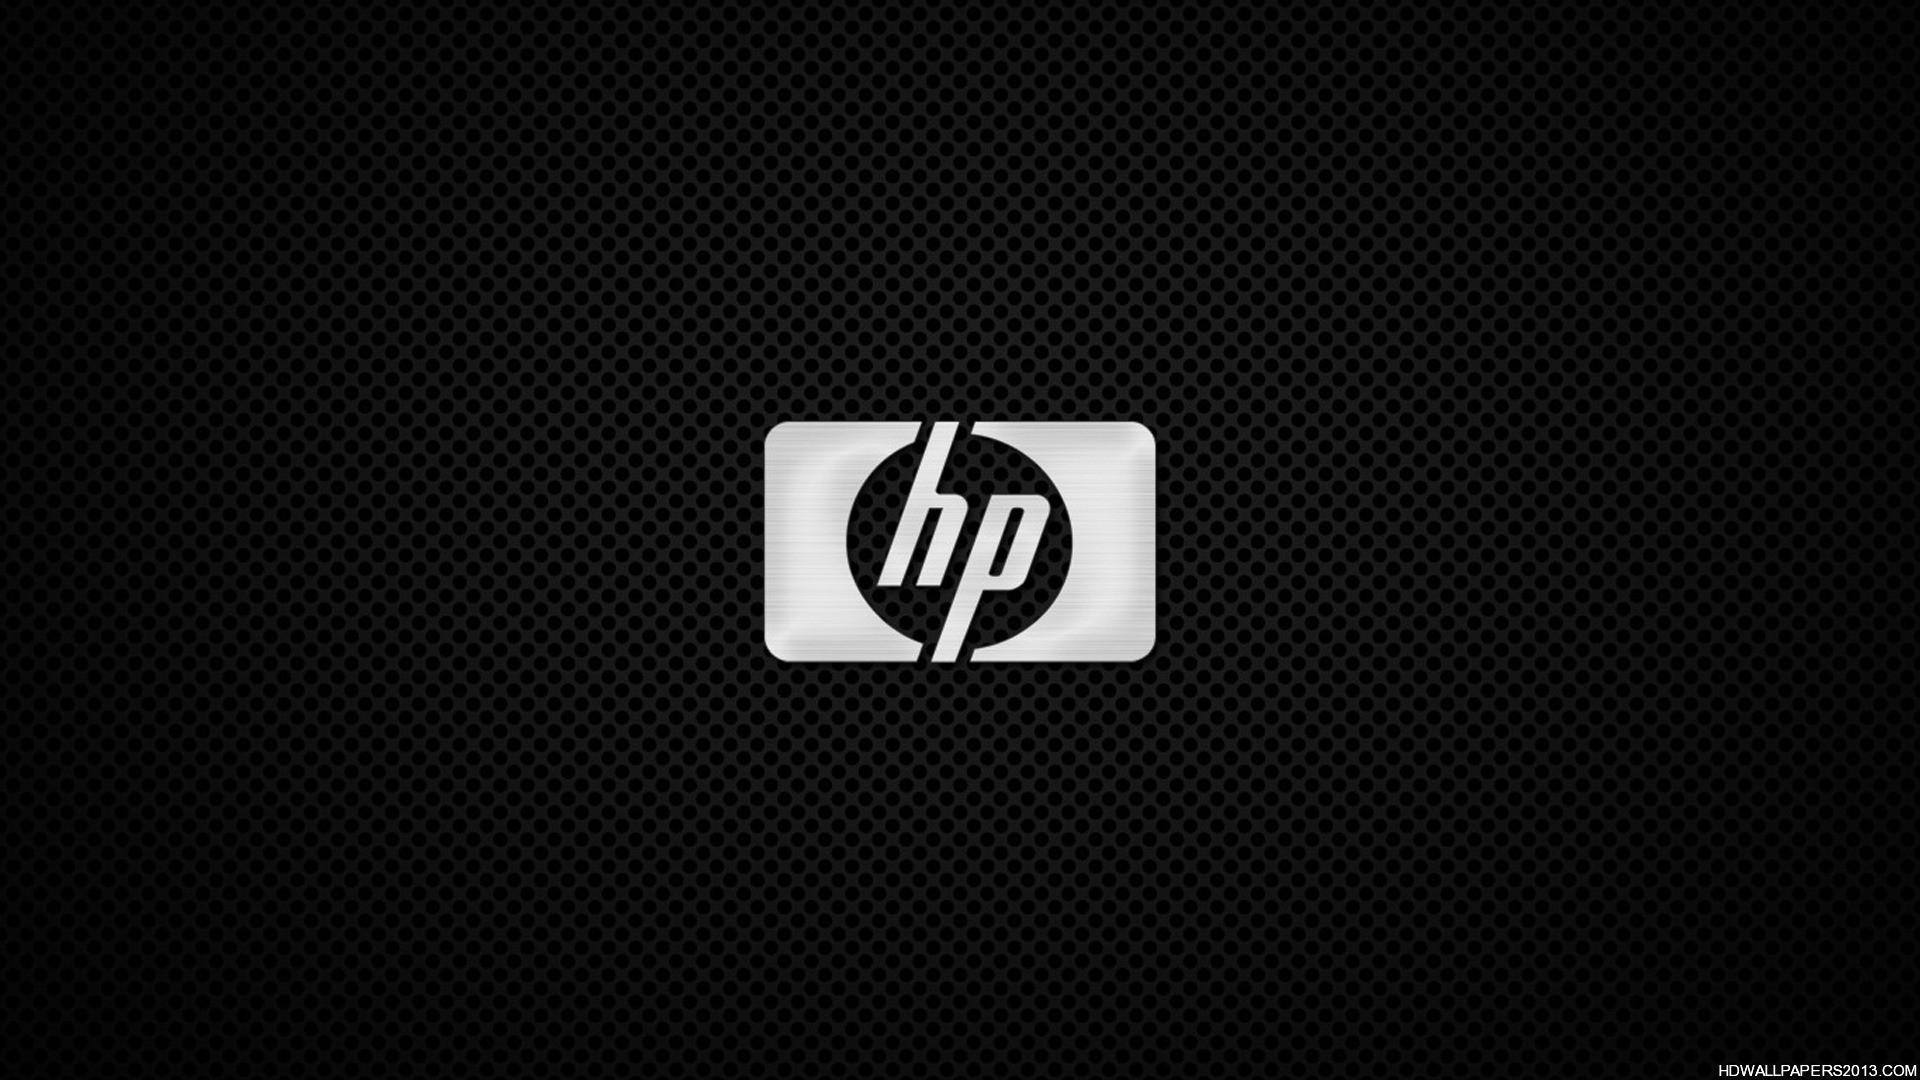 hp wallpaper for laptop hd wallpapers hp wallpaper for laptop hd .